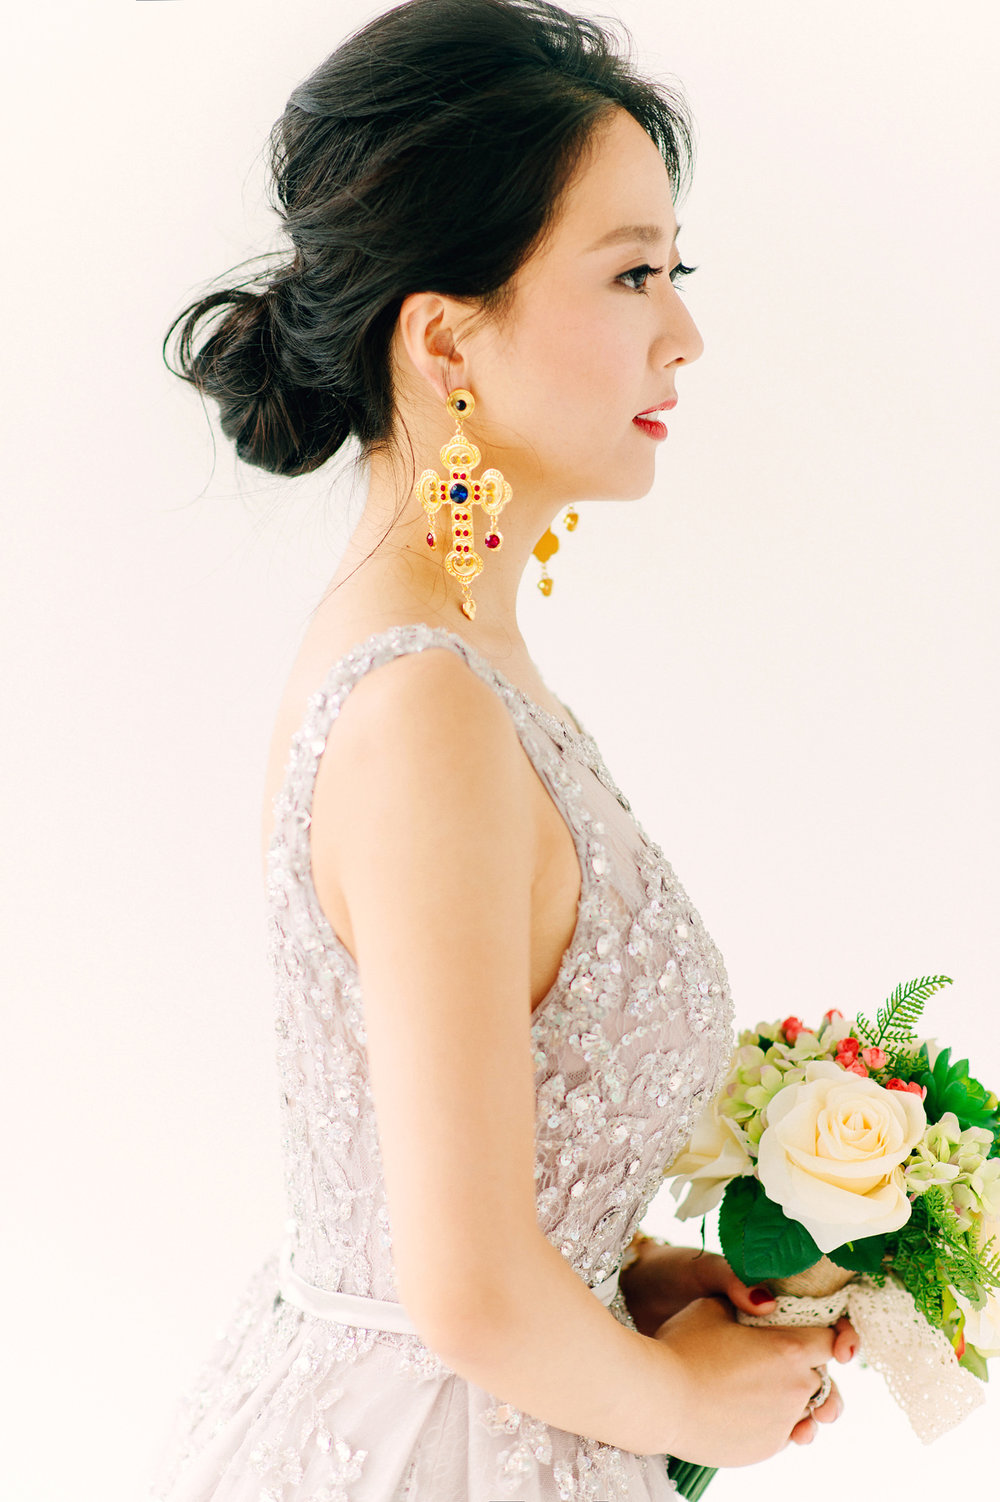 Chris_Hui_婚禮_婚紗照_pre_wedding_photography_best_069_.jpg